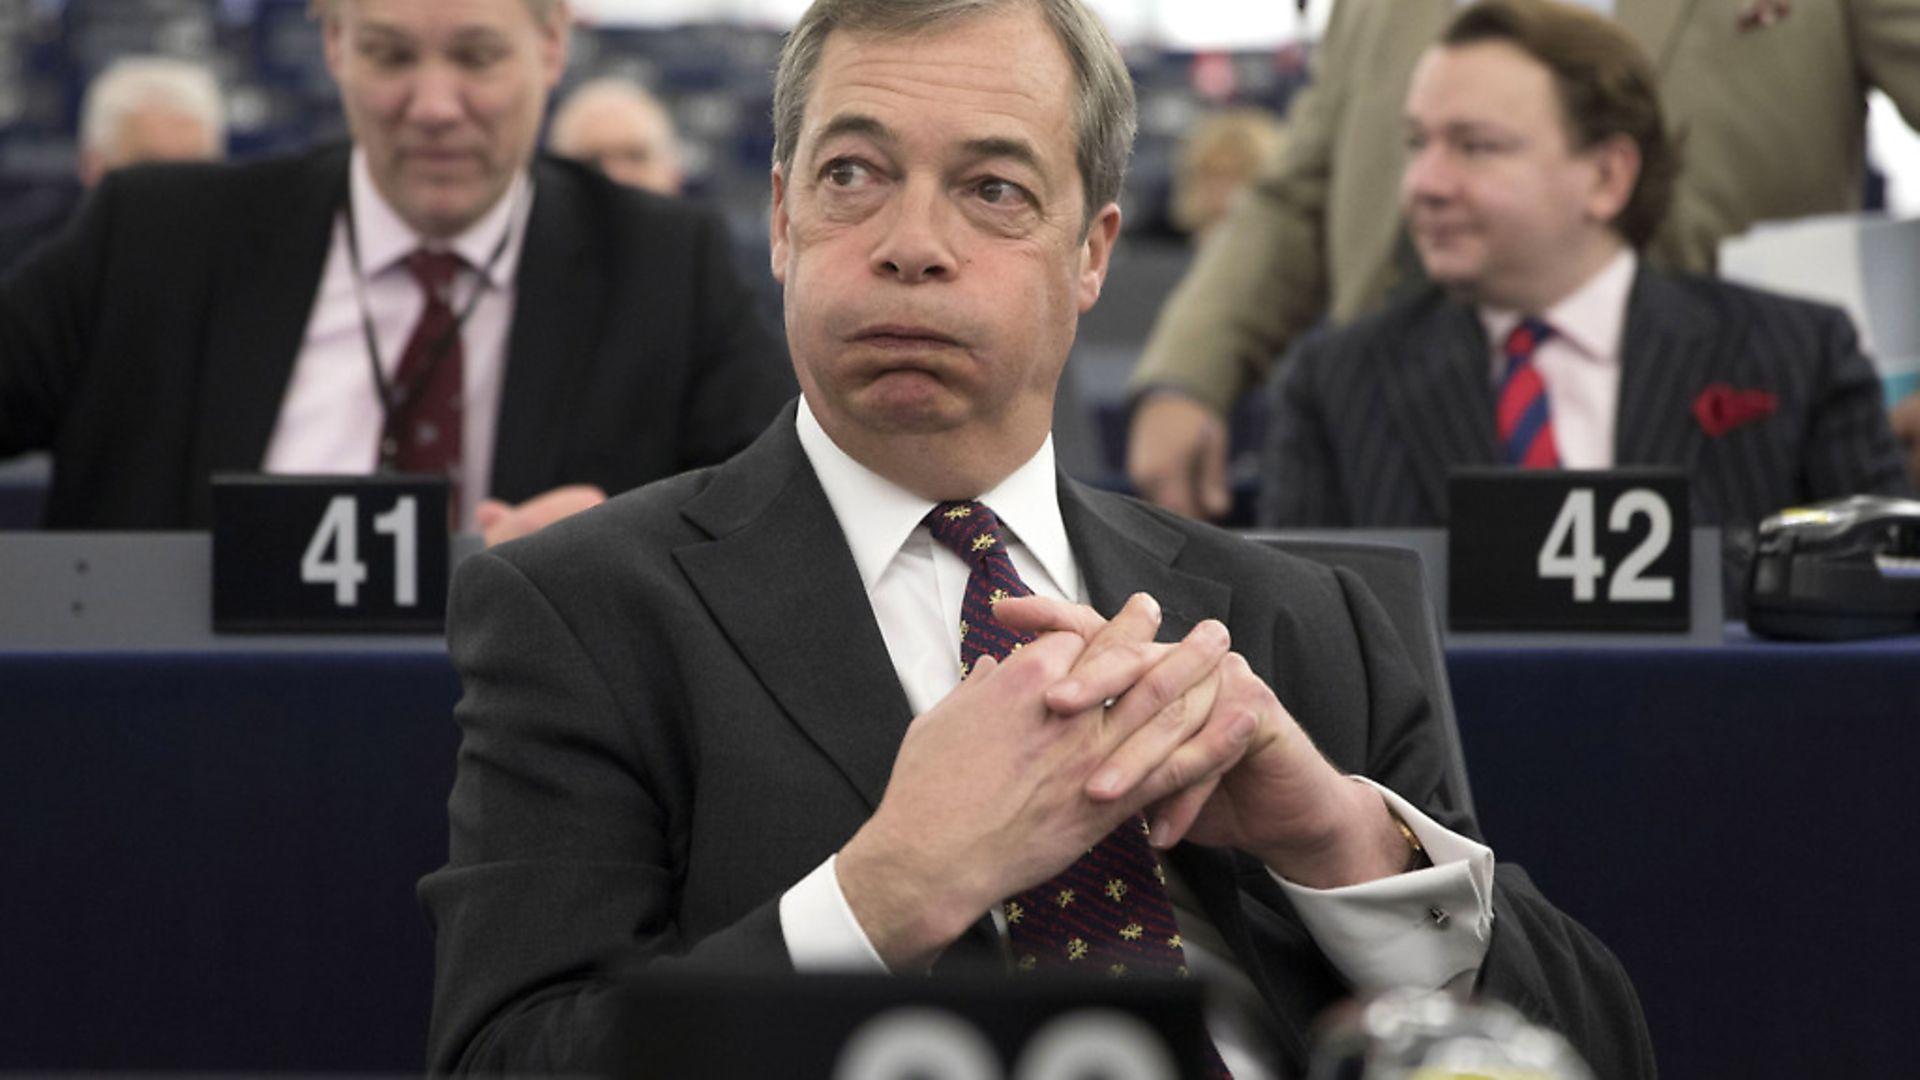 Nigel Farage listens to a debate in the European parliament. Photograph: AP Photo/Jean-Francois Badias. - Credit: AP